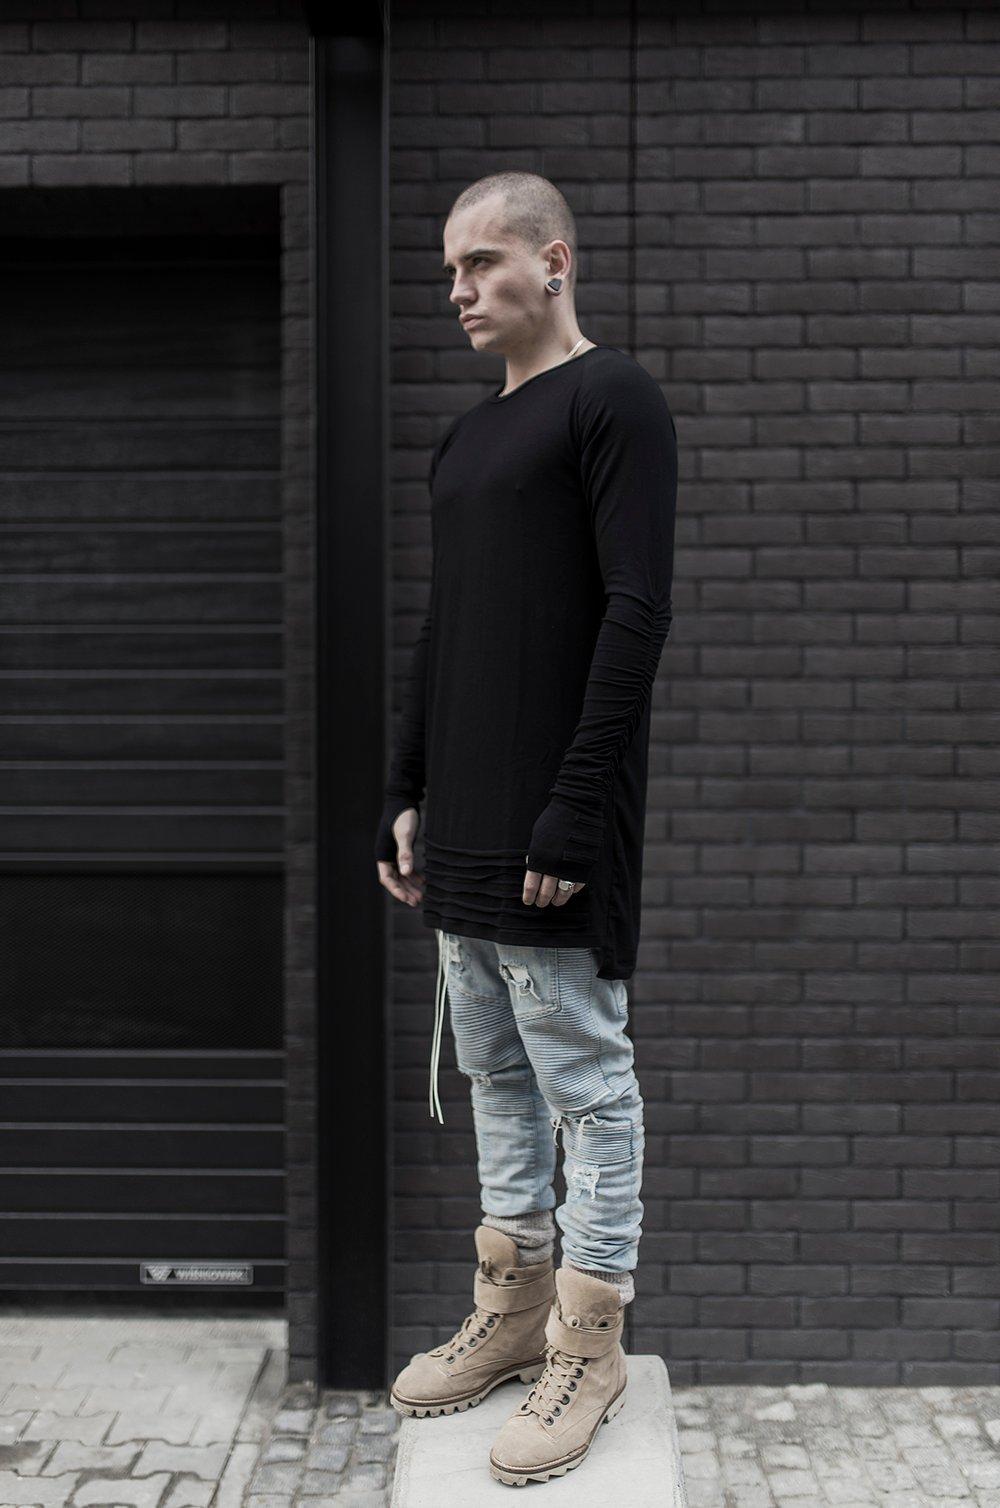 Image of Urban Flavours Mental Extended LongSleeve Black